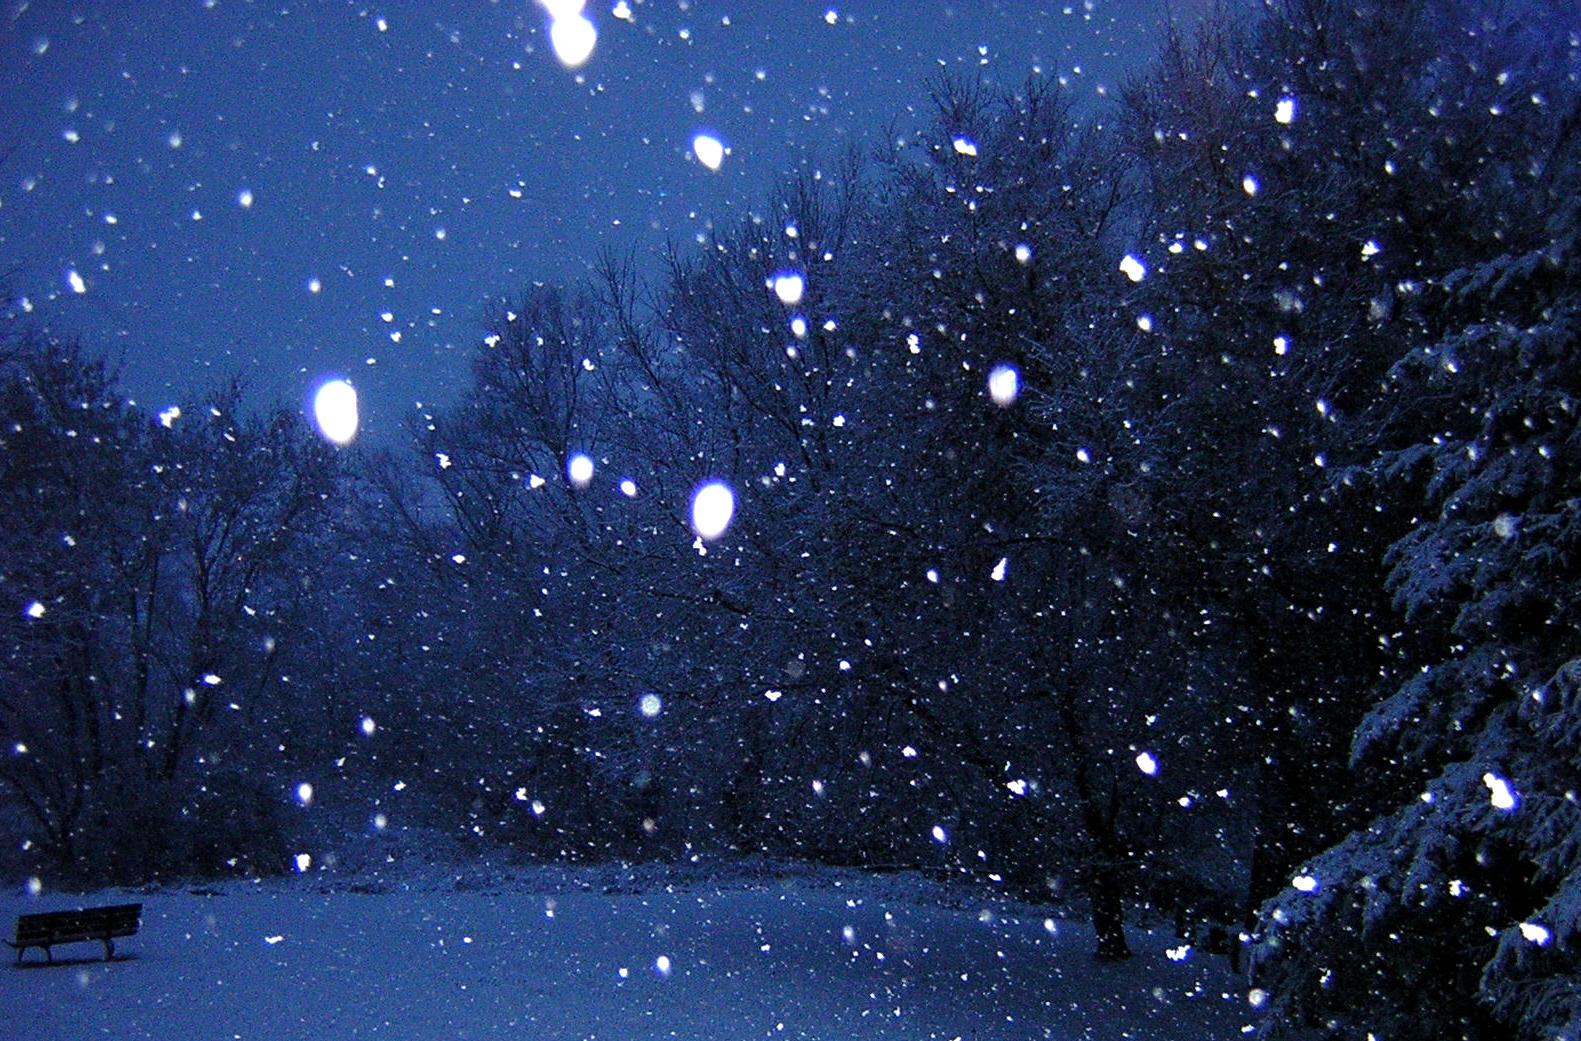 snowy night sky wallpaper wwwpixsharkcom images